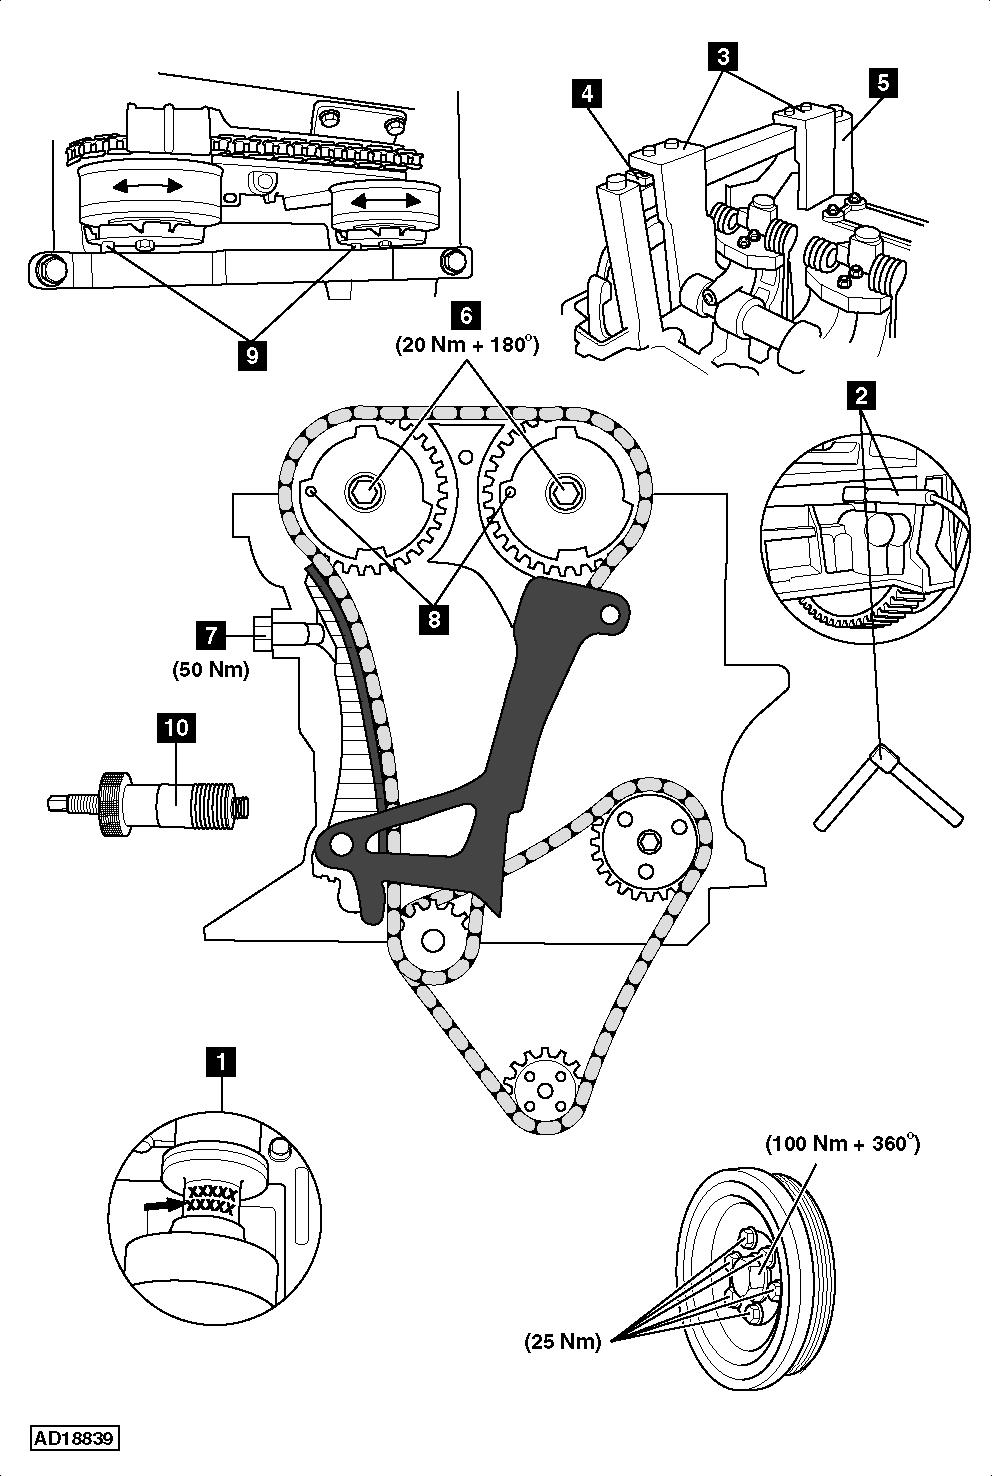 Tx 5559 Bmw 325ci Engine Belt Diagram Download Diagram